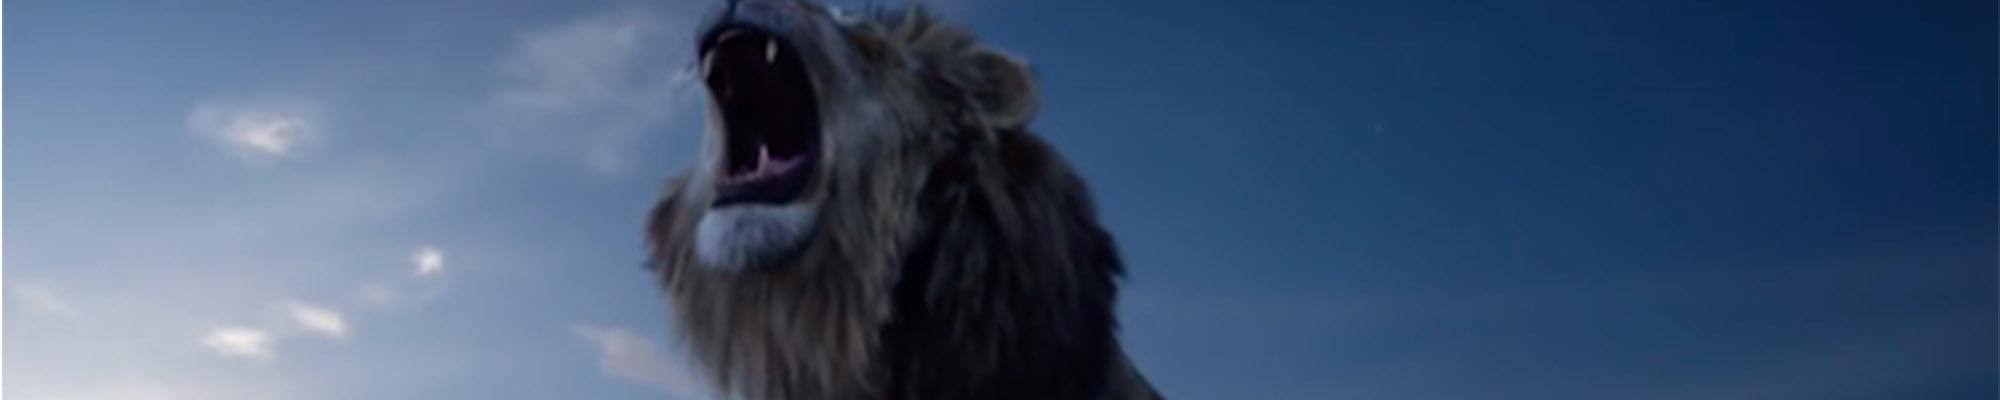 CG电影《狮子王》竟与动画版的分镜如此相似,期待更多名场面